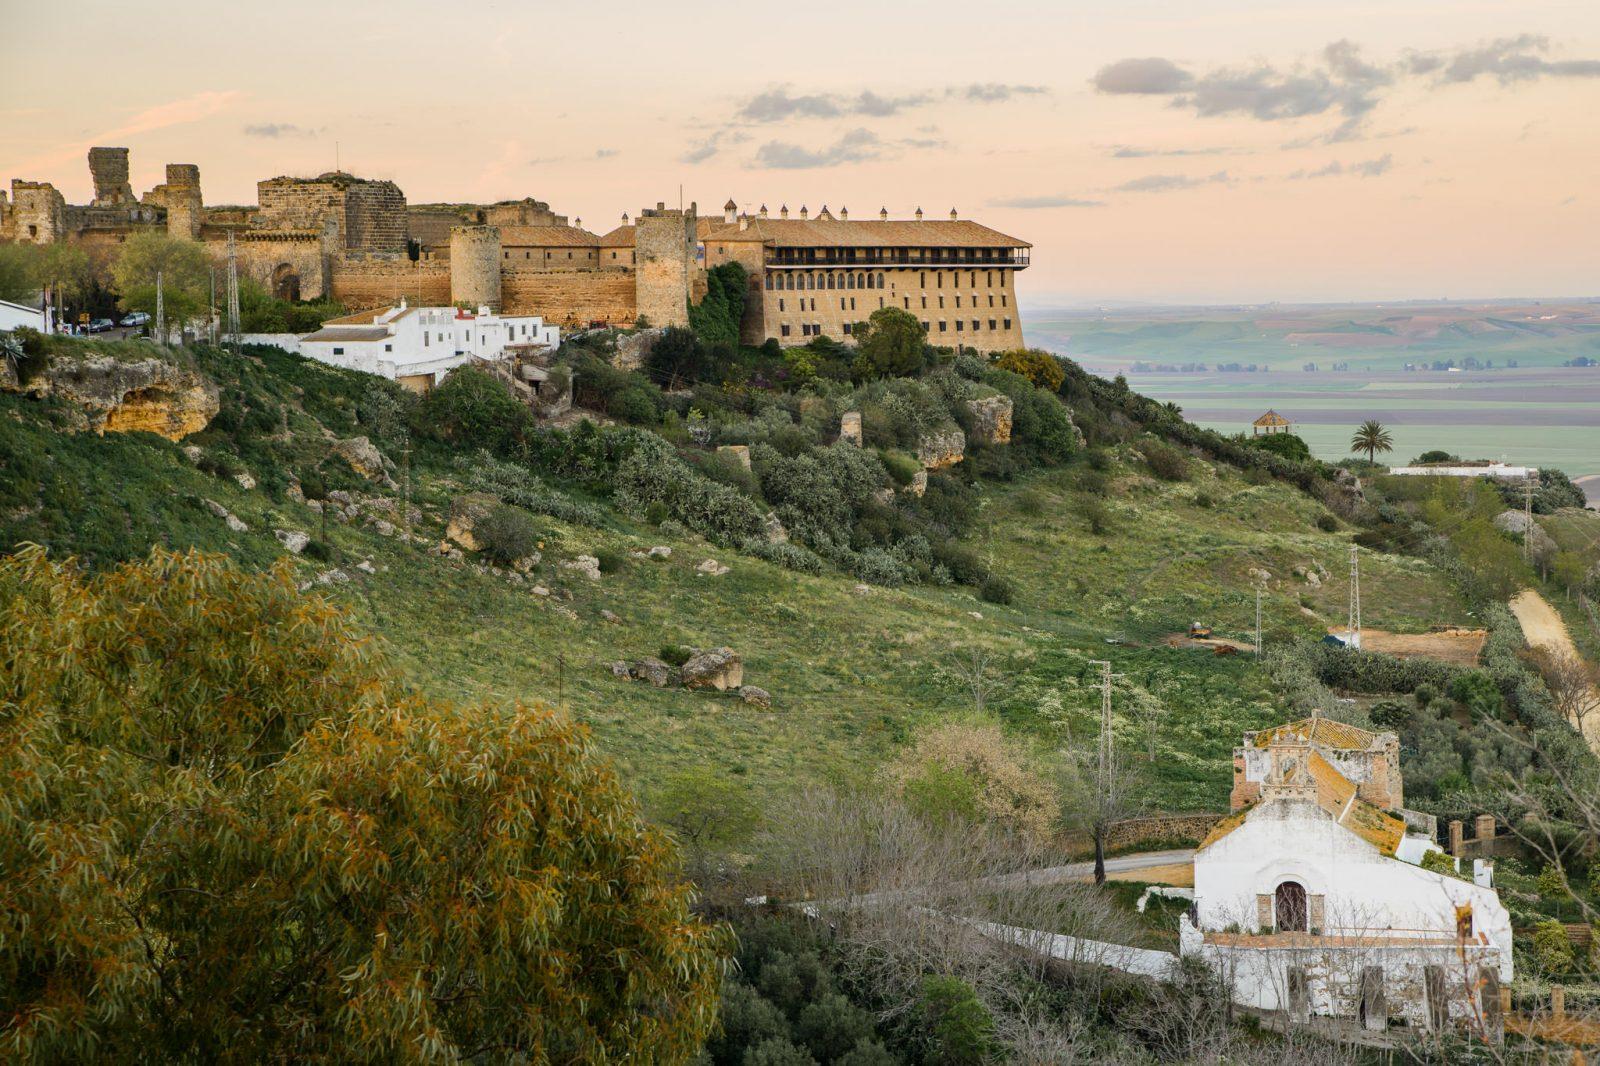 Дворец Педро и Эрмита-де-Сан-Матео (фото: Jose Manuel Martin)